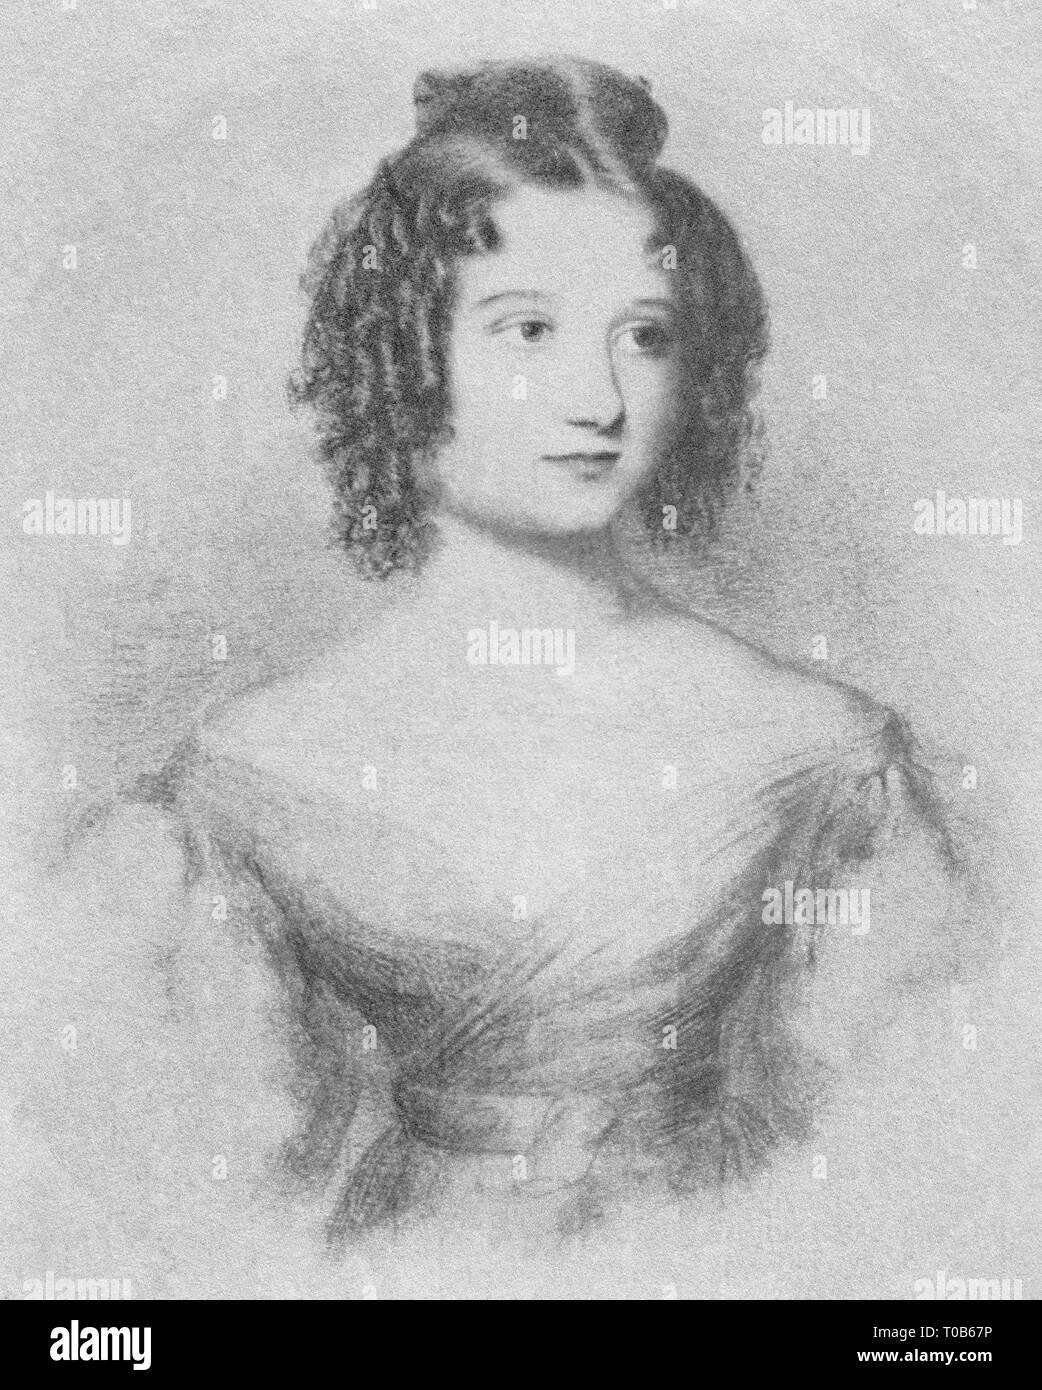 Ada Byron Lovelace, aged seventeen (1832) - Stock Image